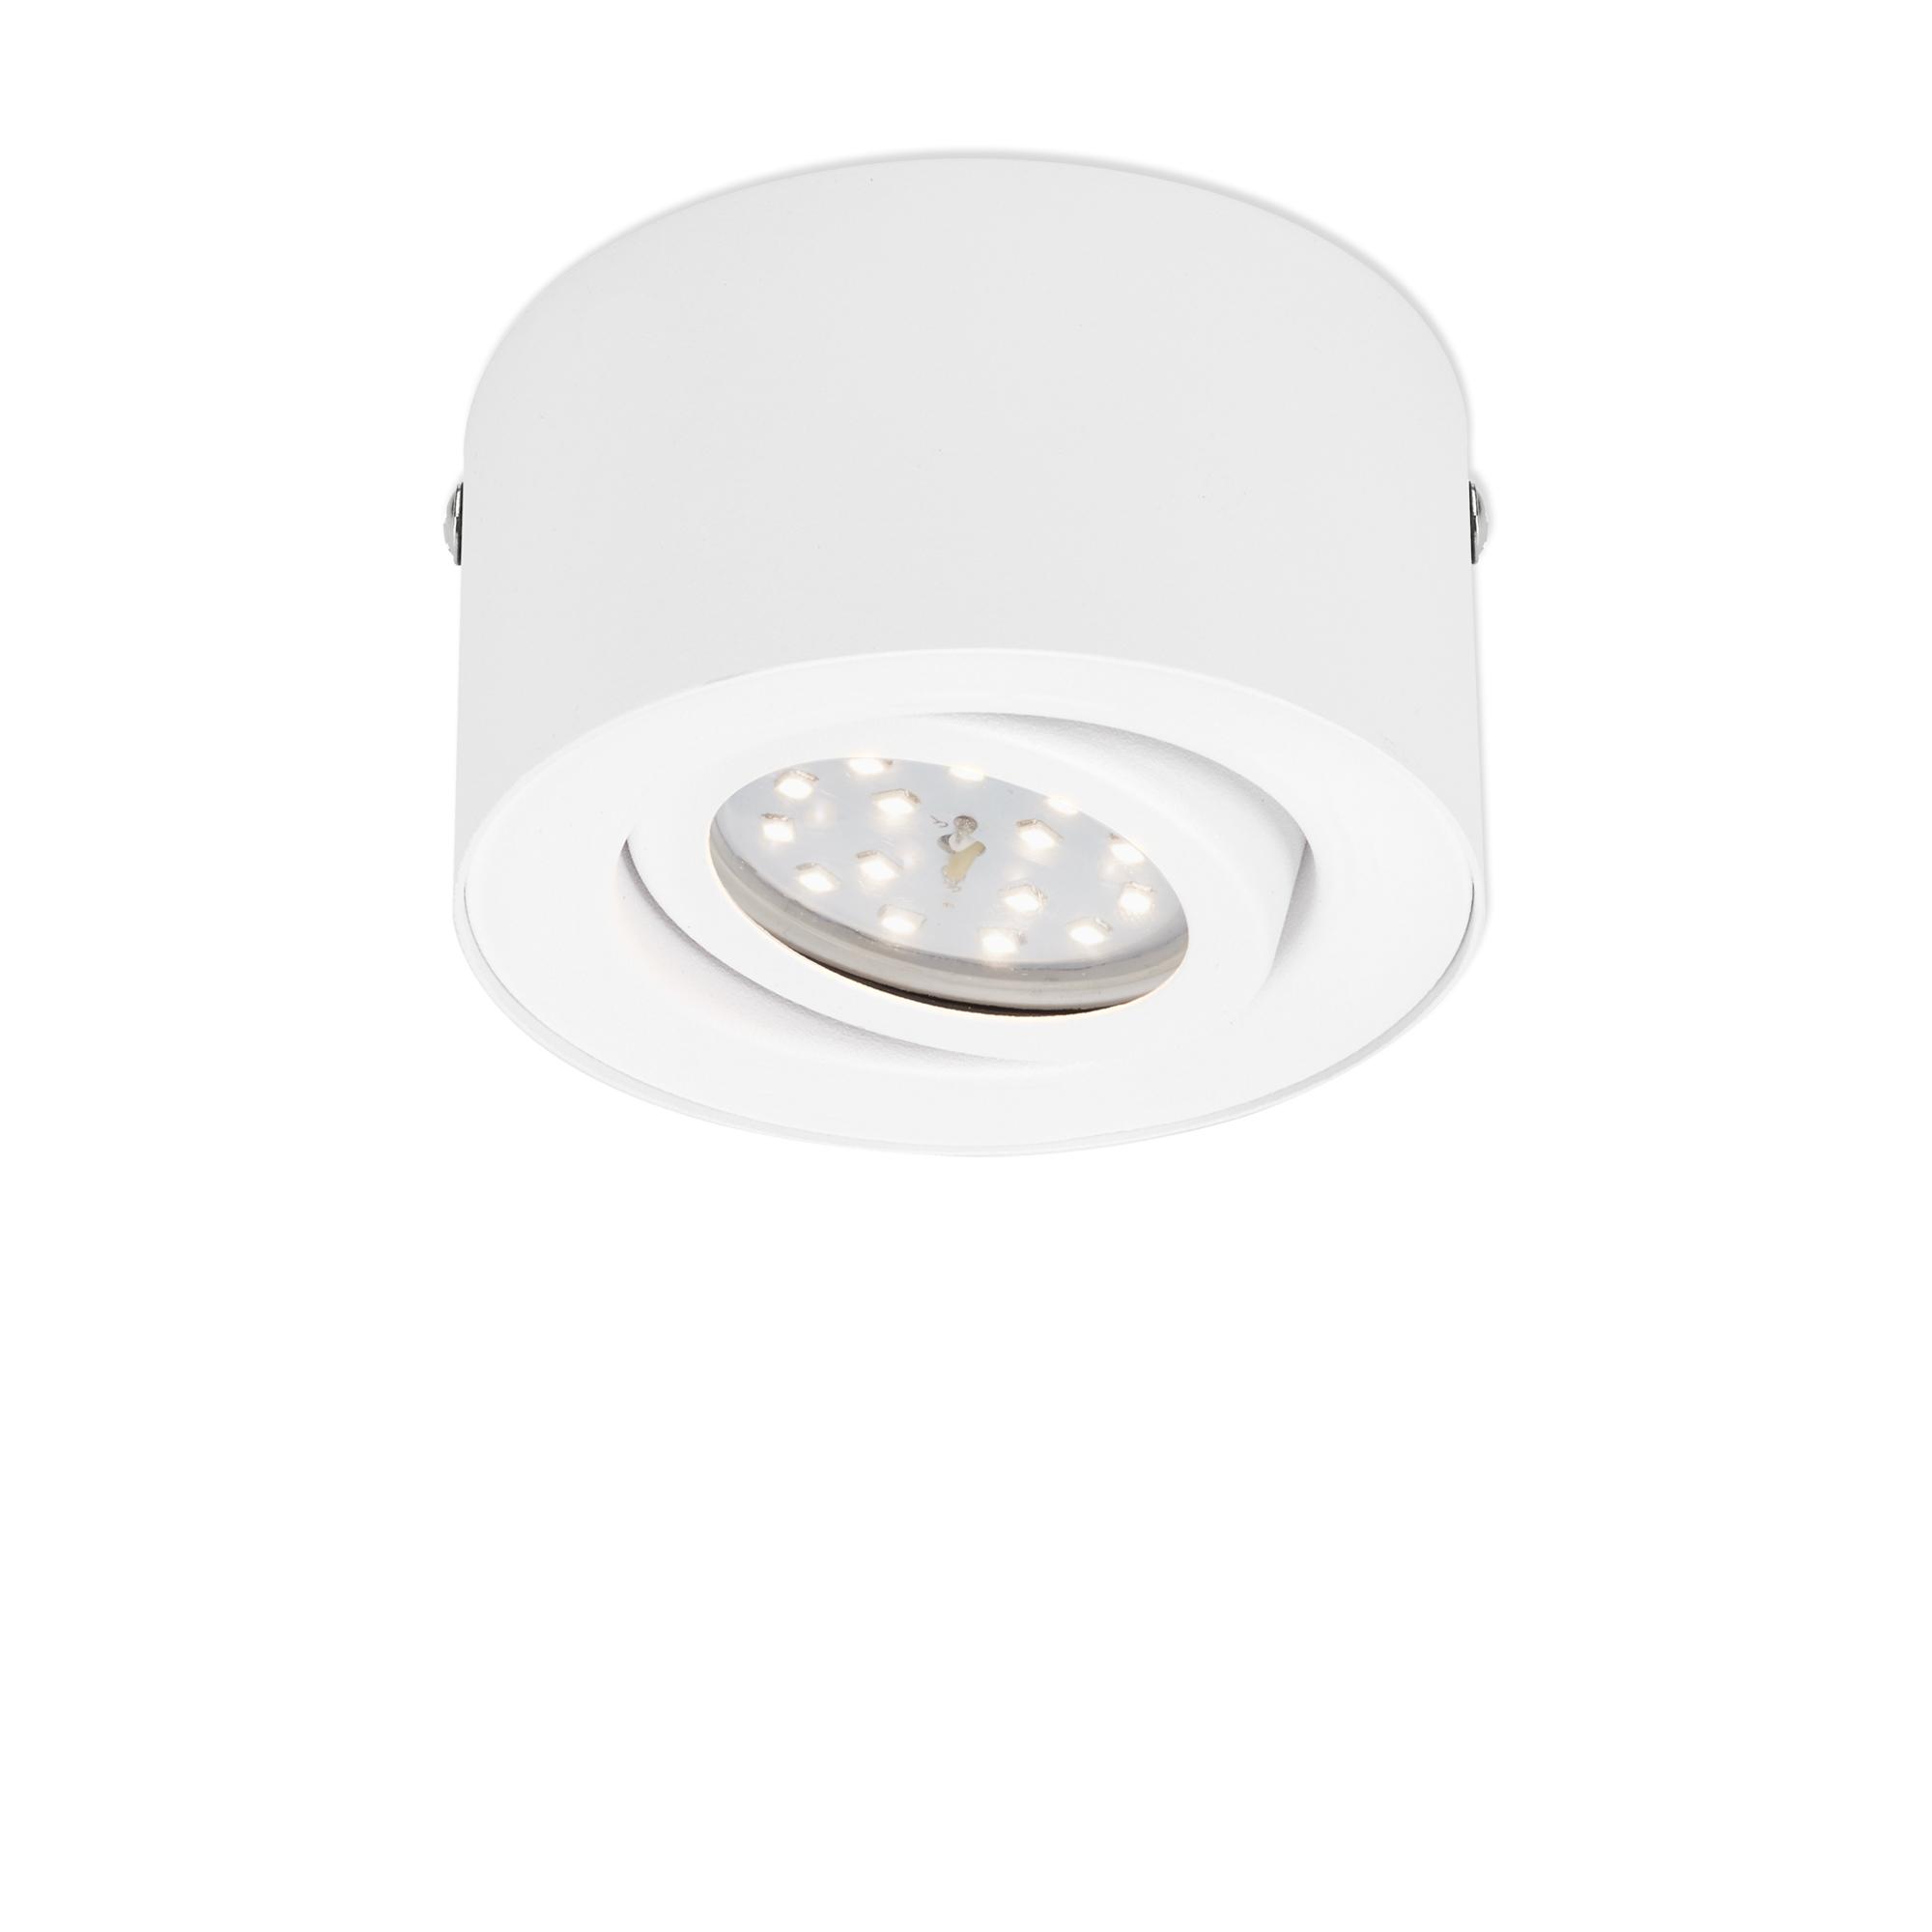 LED Aufbauleuchte, Ø 9 cm, 5 W, Weiß